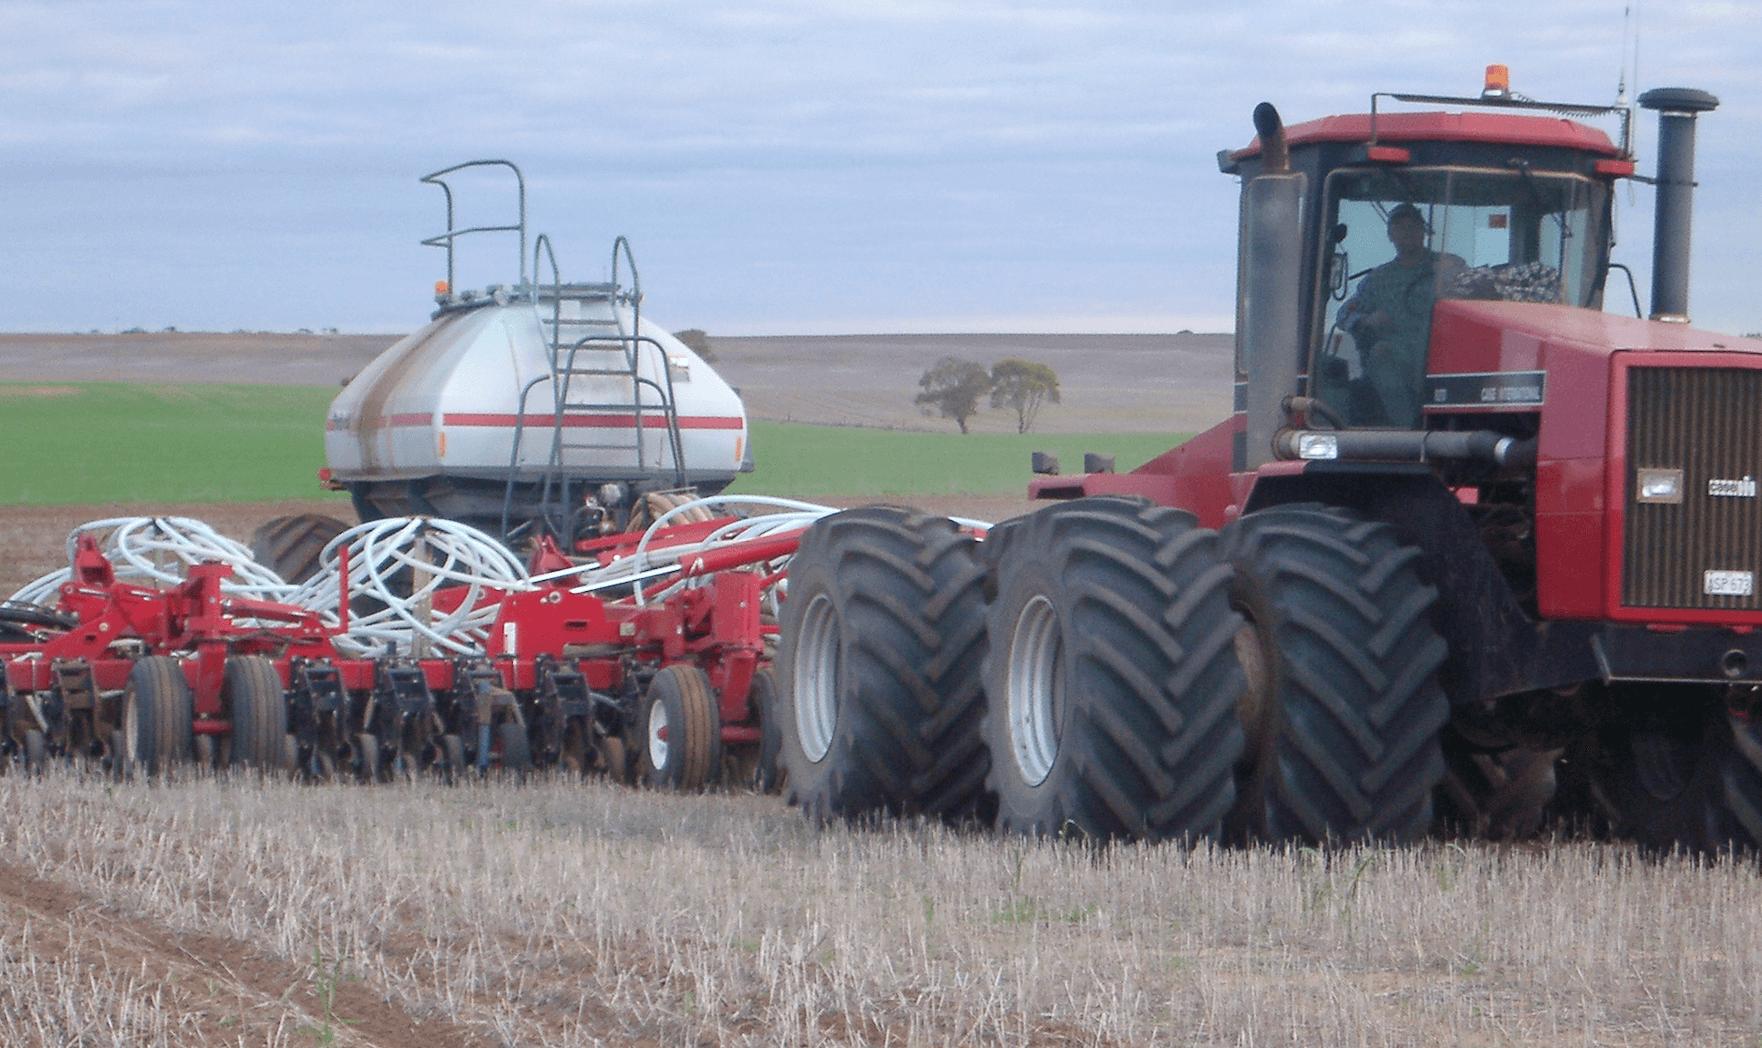 Getting dry seeding right